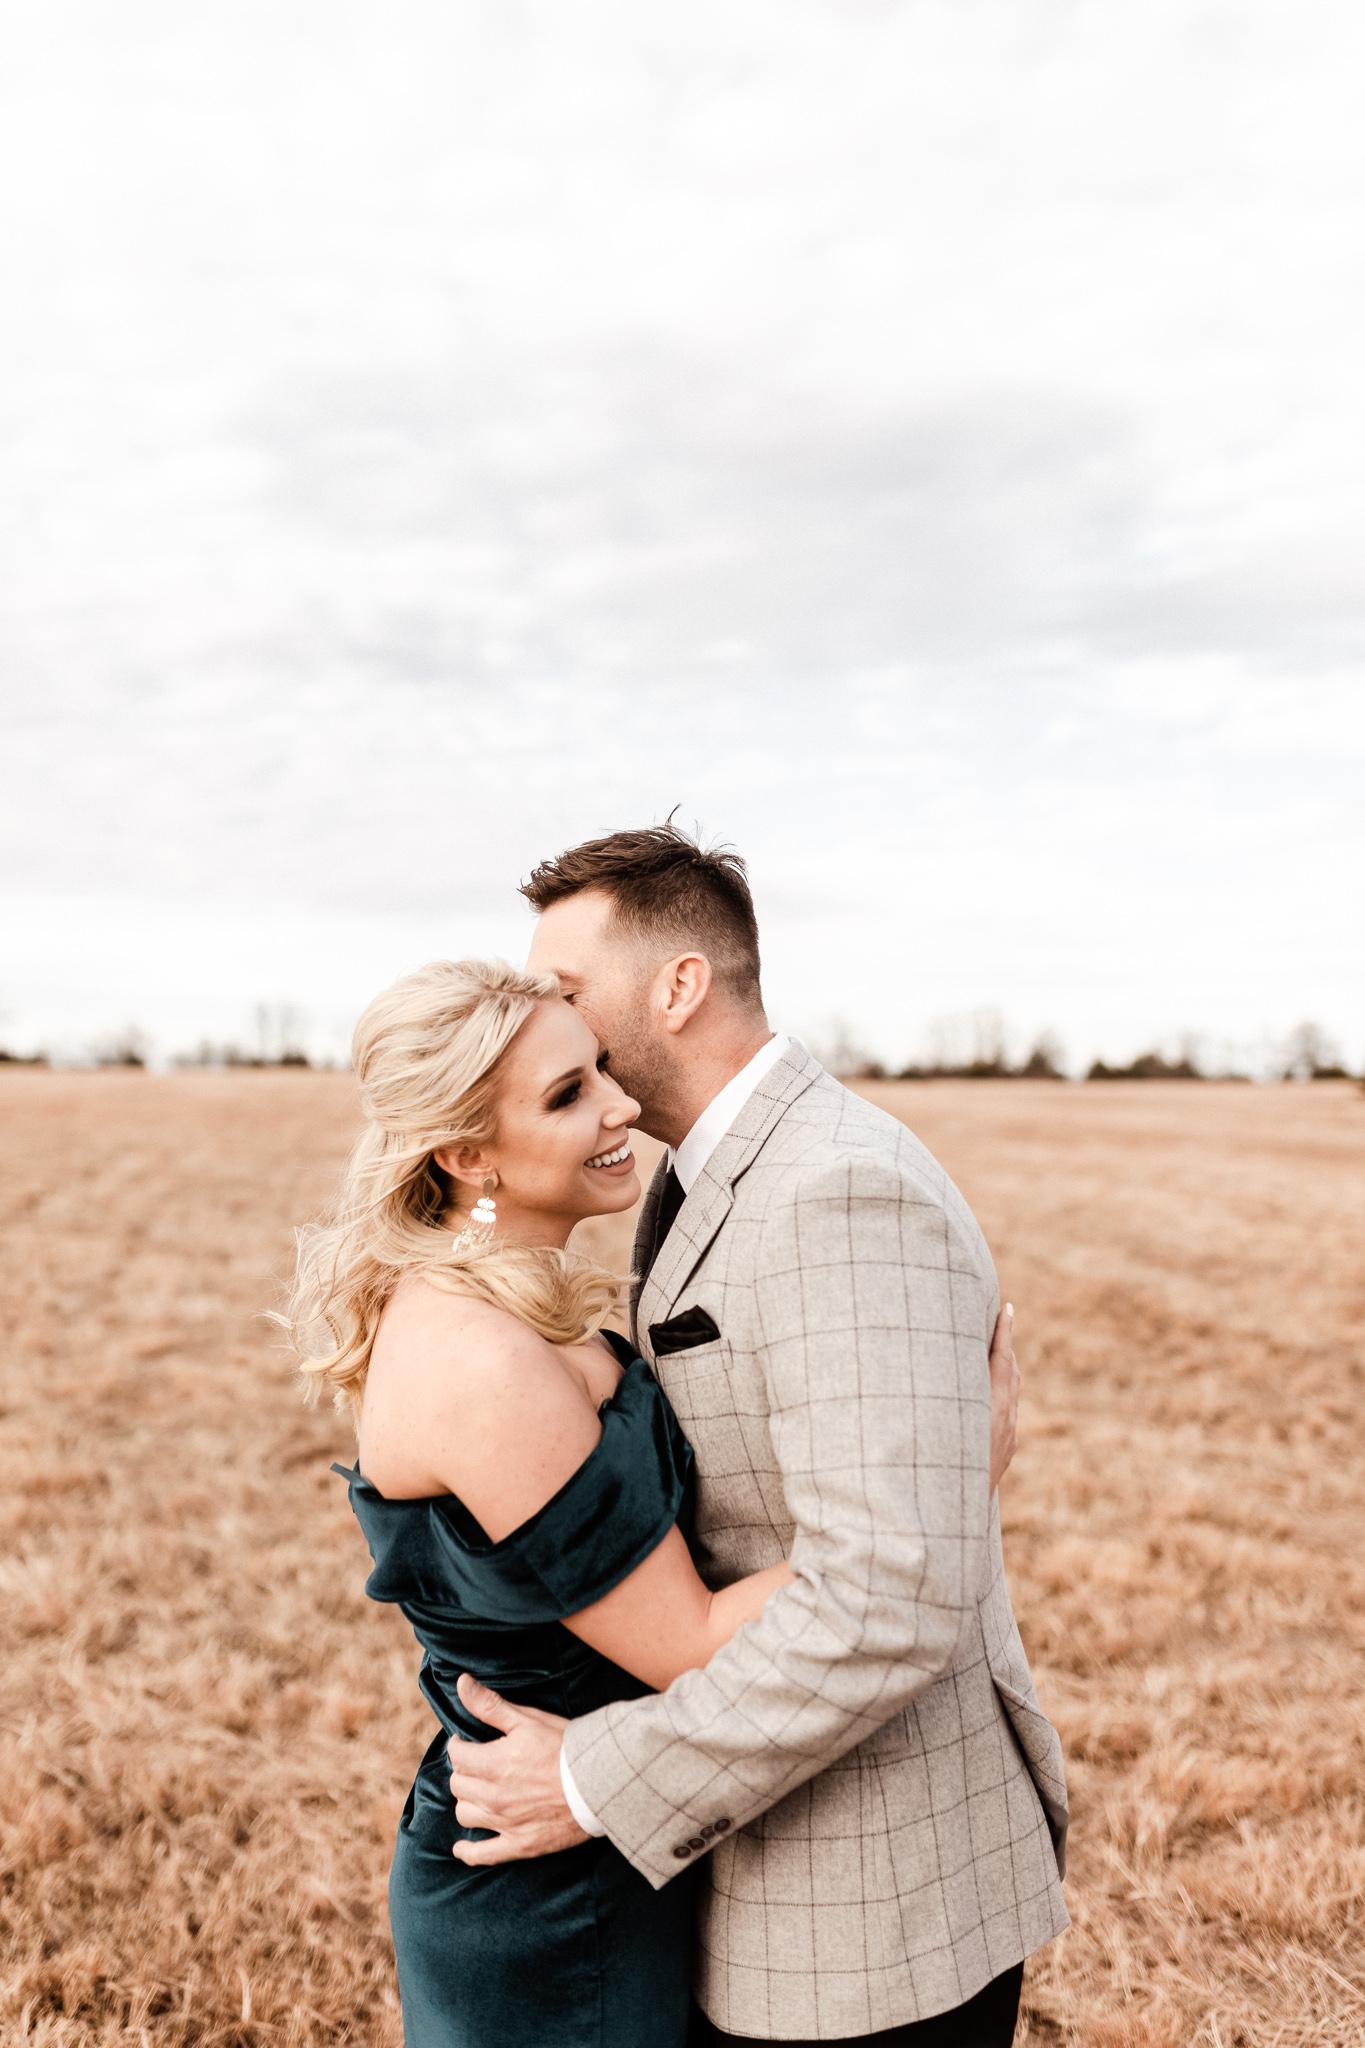 Wade + Stephanie | Warm Open Field Engagements | Oklahoma Wedding Photographer-6.jpg